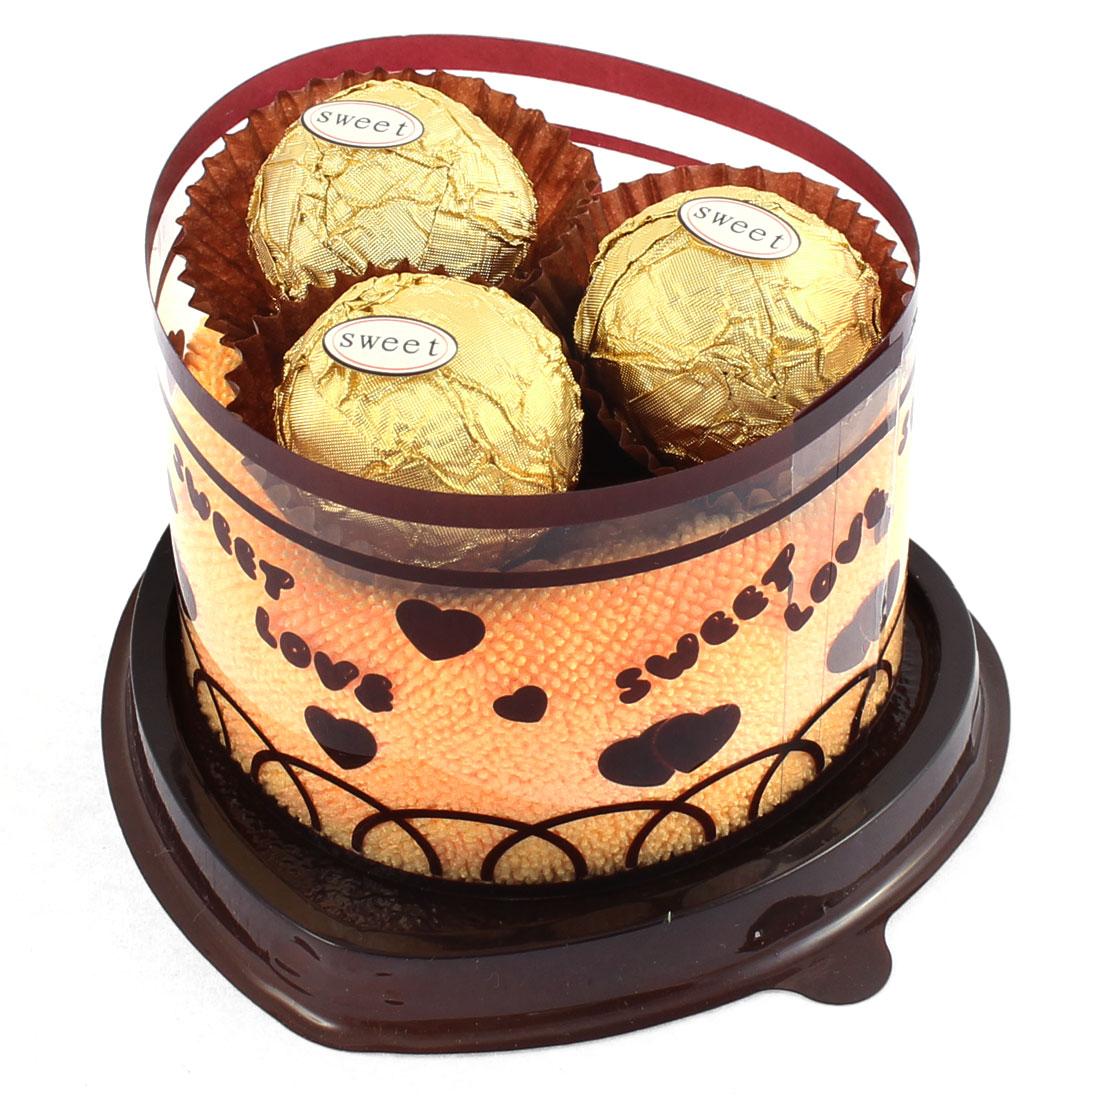 Heart Cake Design Chocolate Decor Wedding Party Gift Washcloth Hand Towel Orange